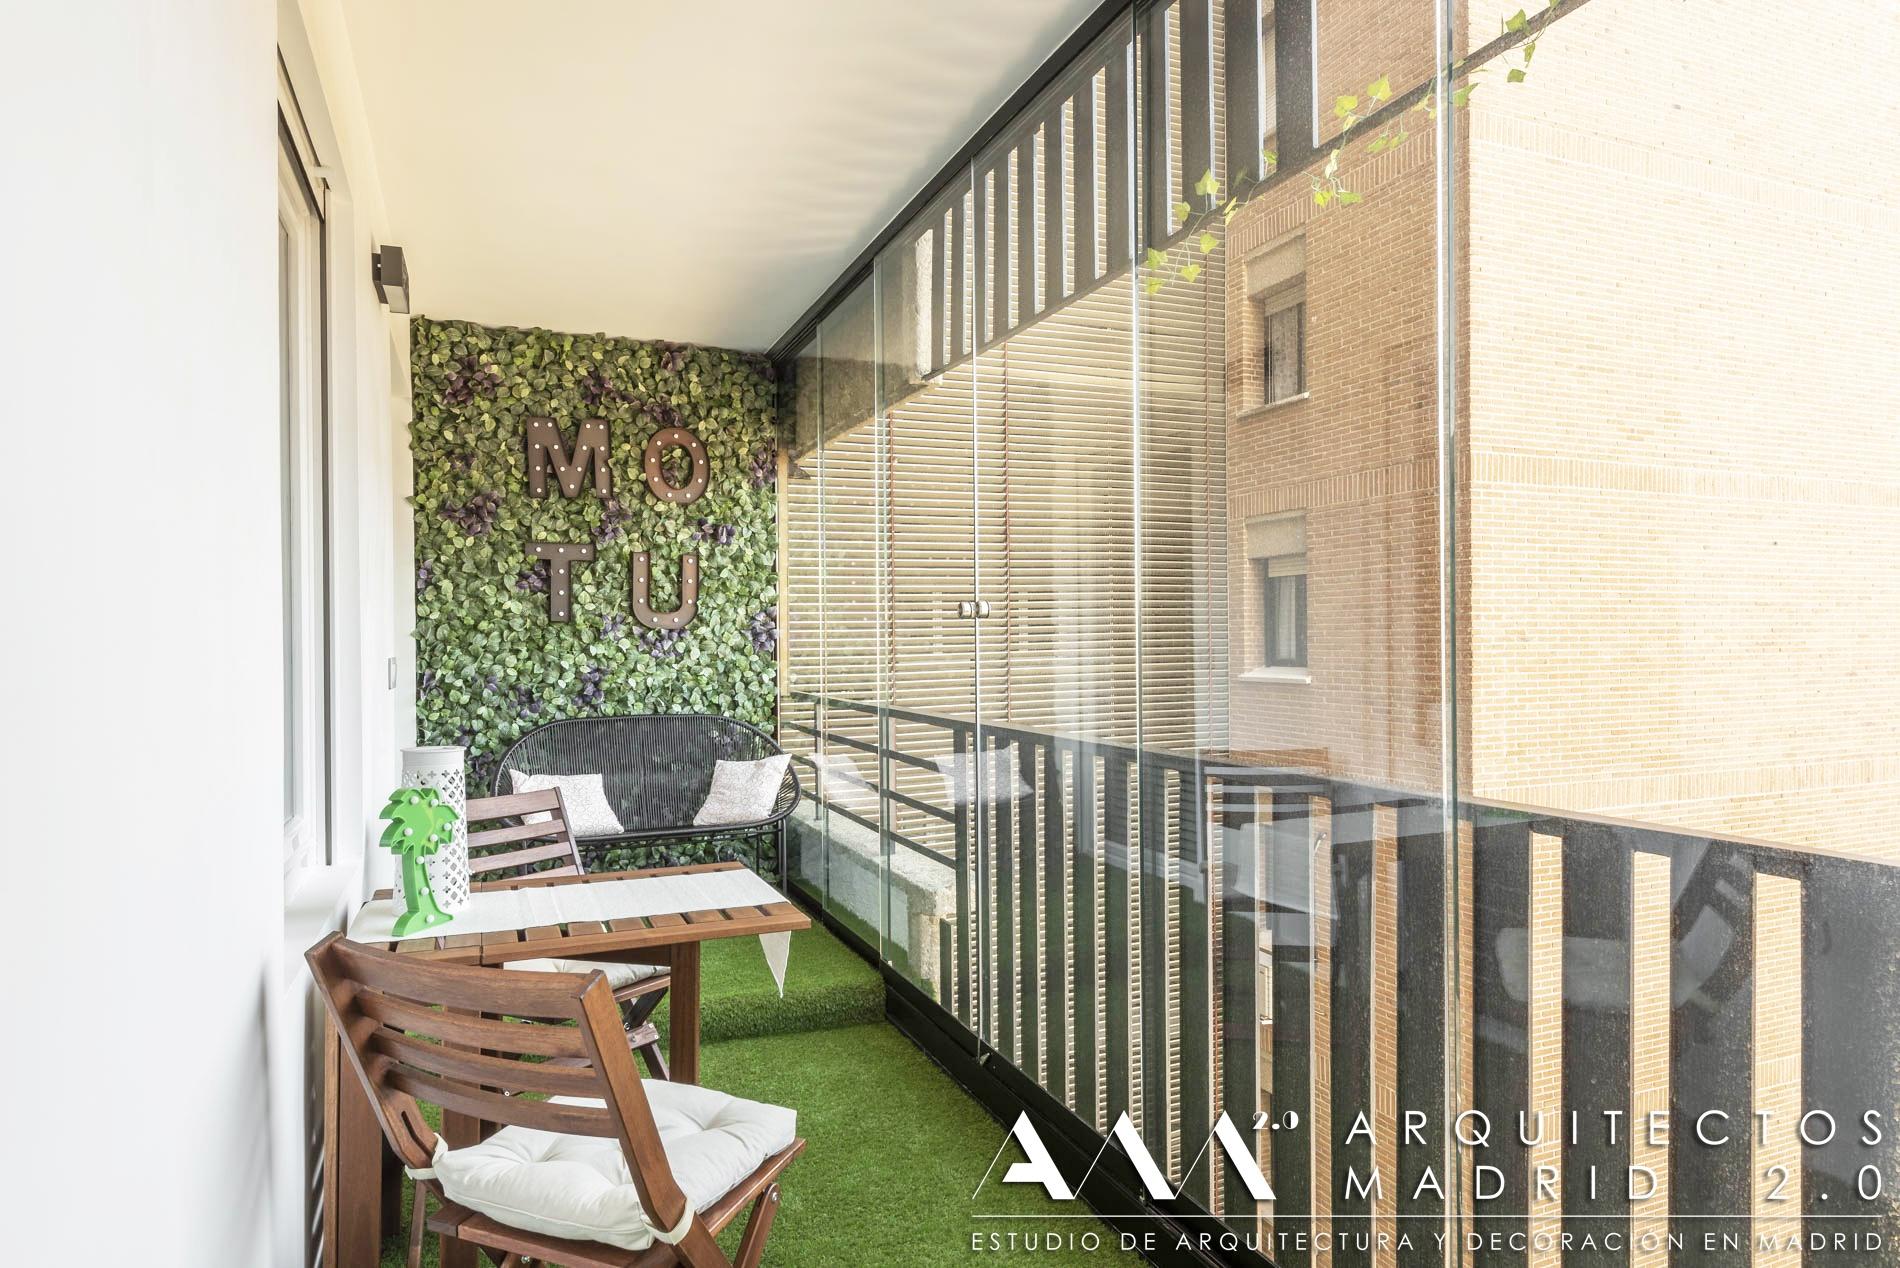 reforma-vivienda-housing-reform-architects-design-by-arquitectos-madrid-08